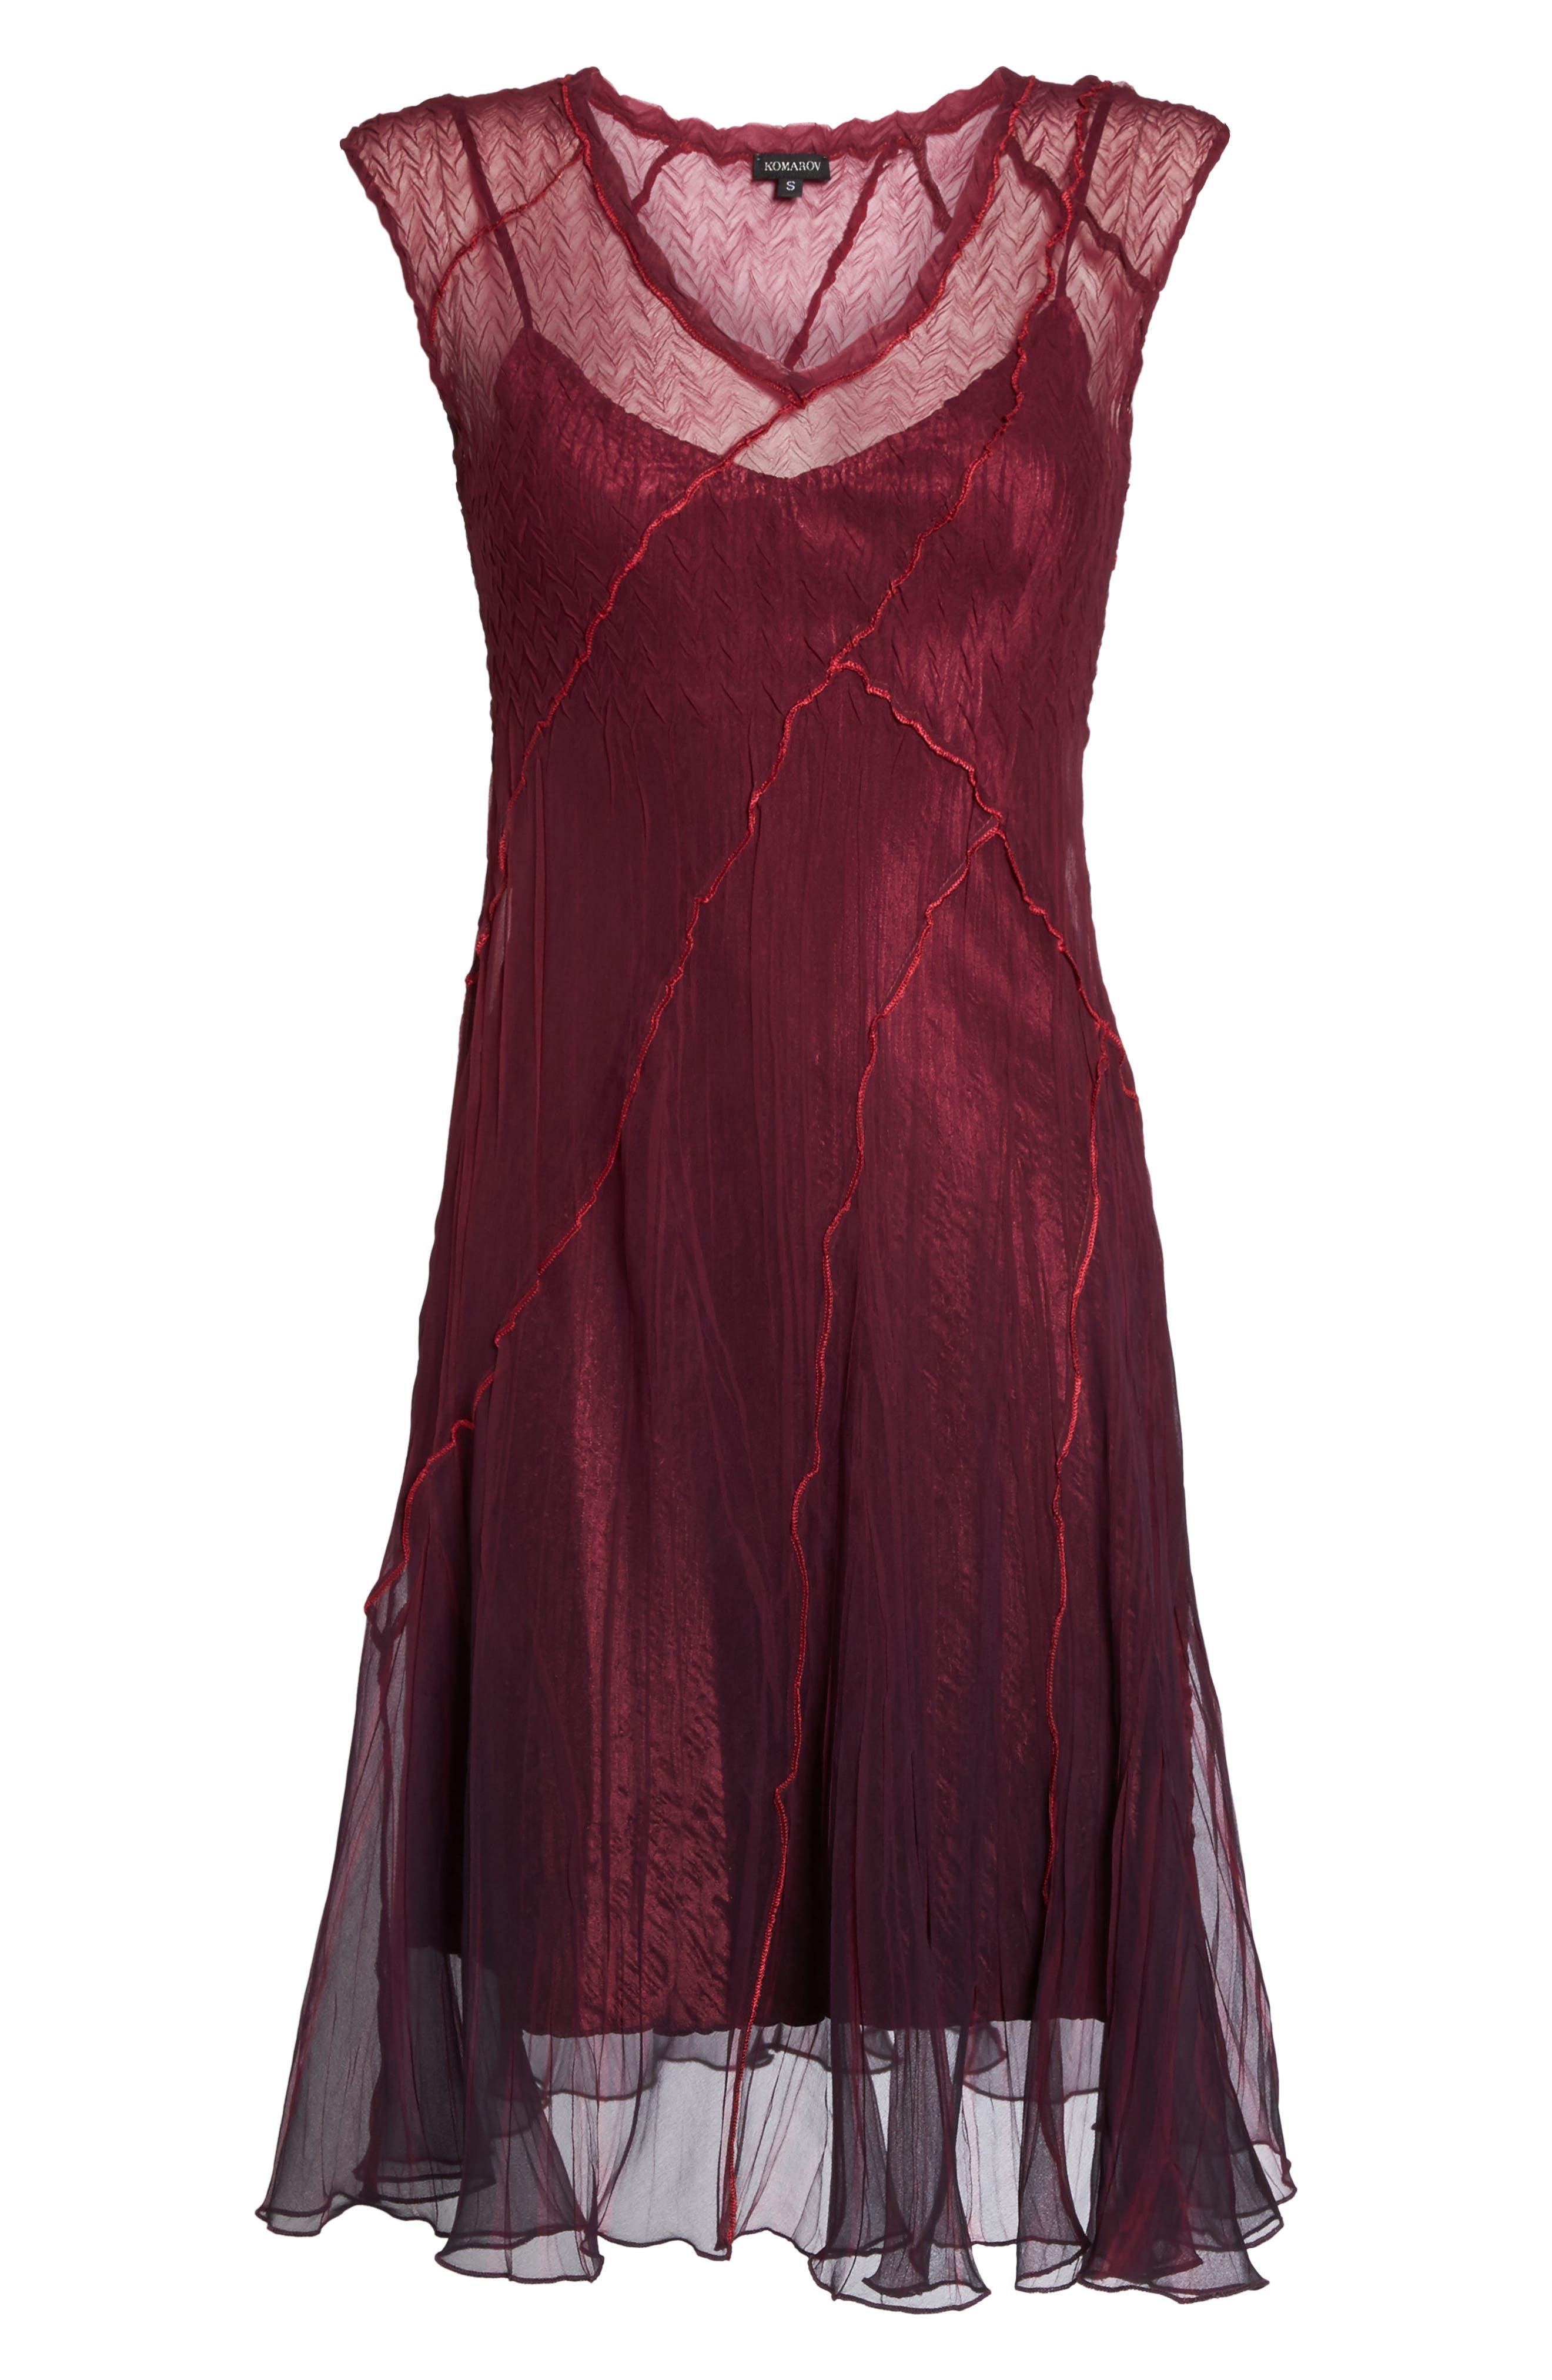 Chiffon A-Line Dress,                             Alternate thumbnail 6, color,                             Red Plum Blue Ombre